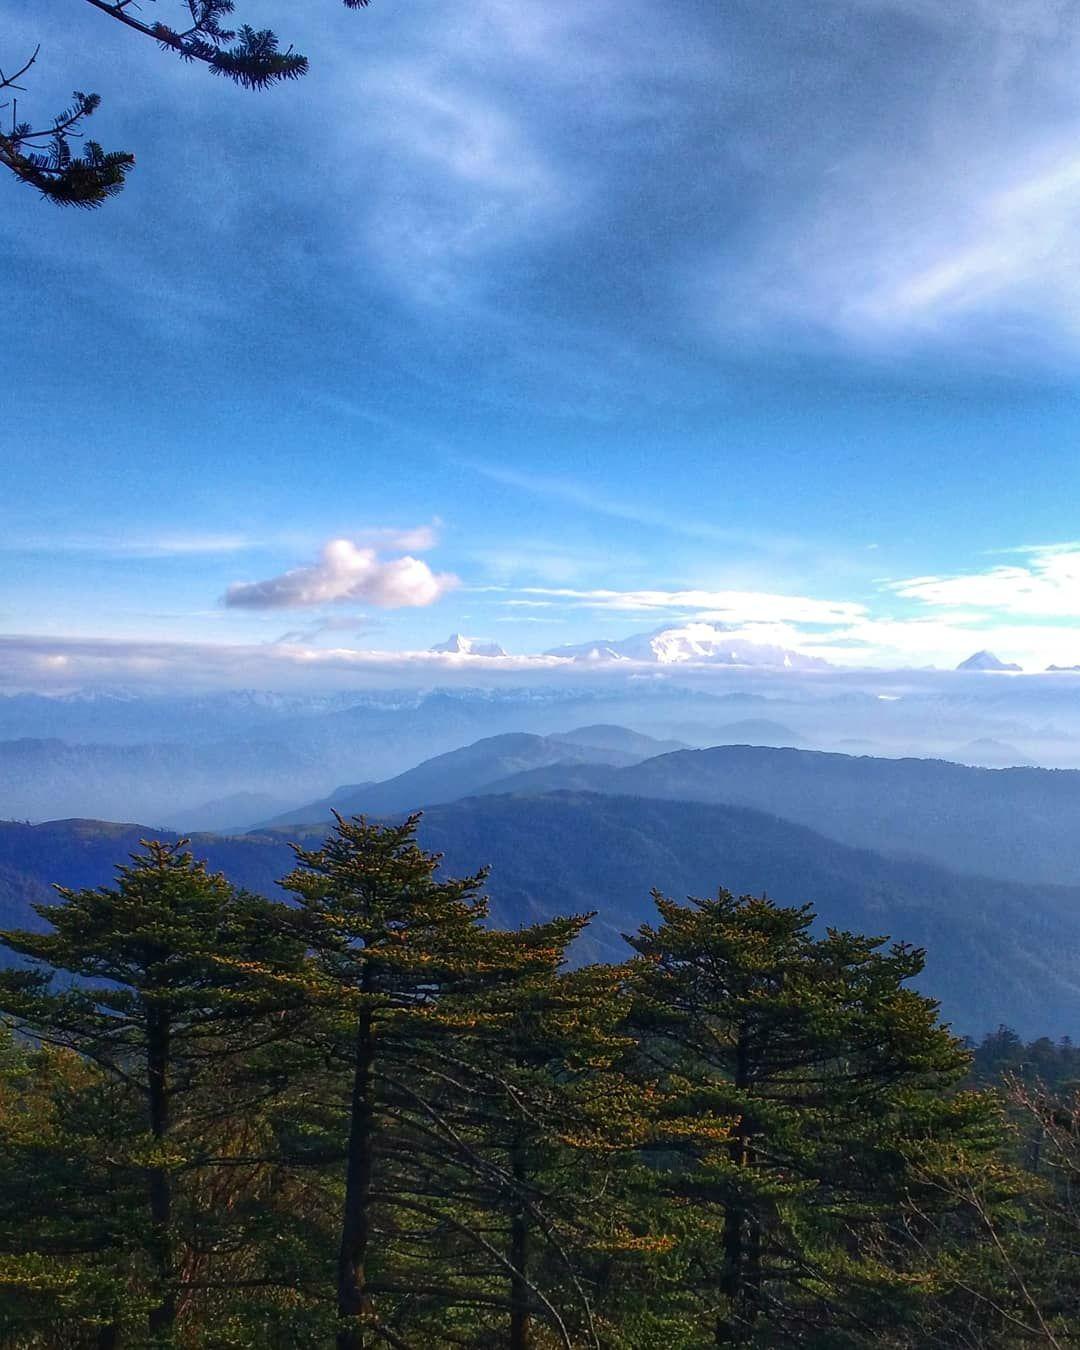 Photo of Mount Everest By Adib Shaikh